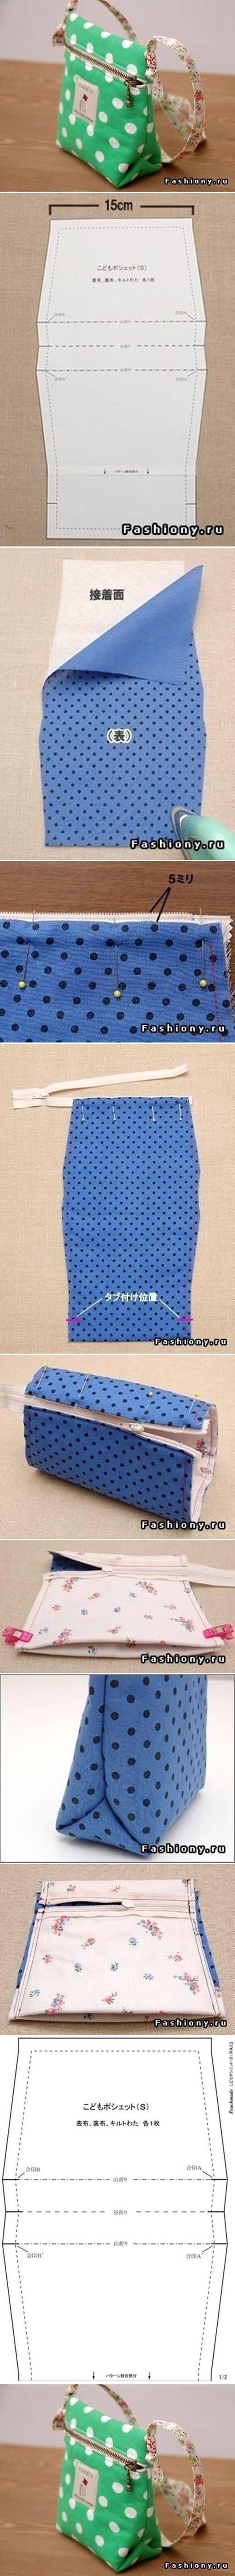 DIY Small Sew Handbag DIY Small Sew Handbag